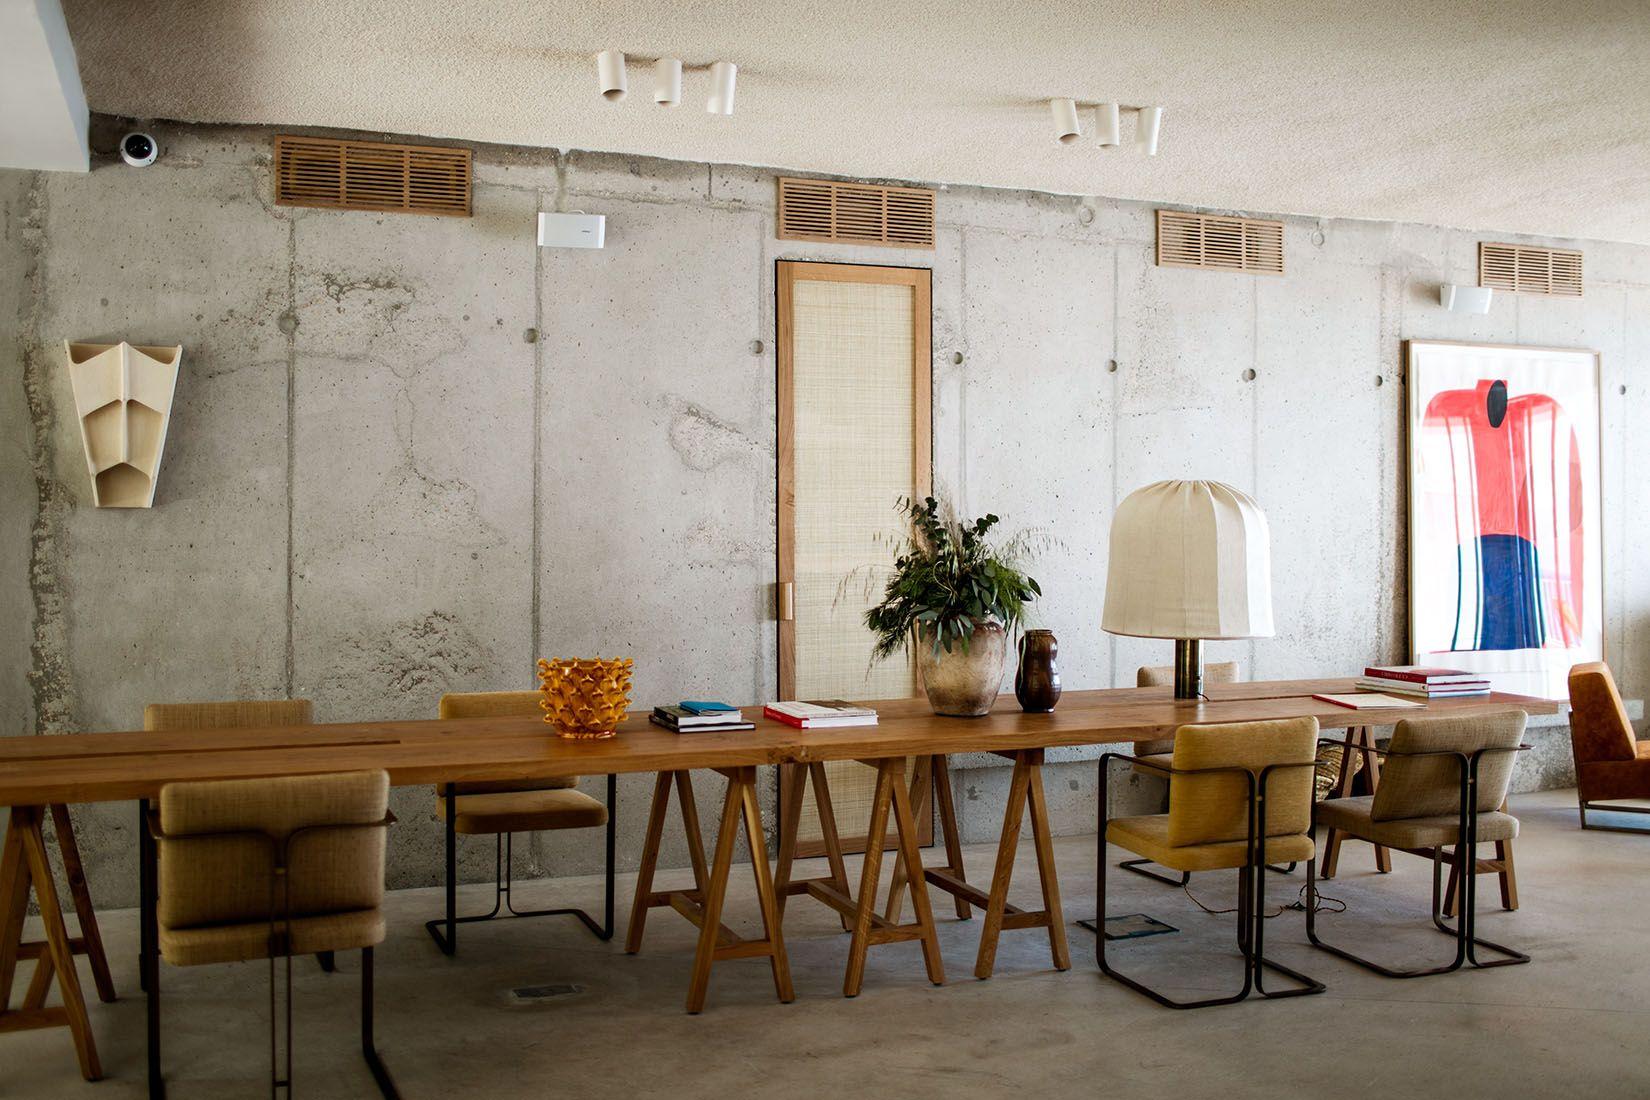 festen architects hotel les roches rouges materiaal kleur textuur french boutique hotel. Black Bedroom Furniture Sets. Home Design Ideas